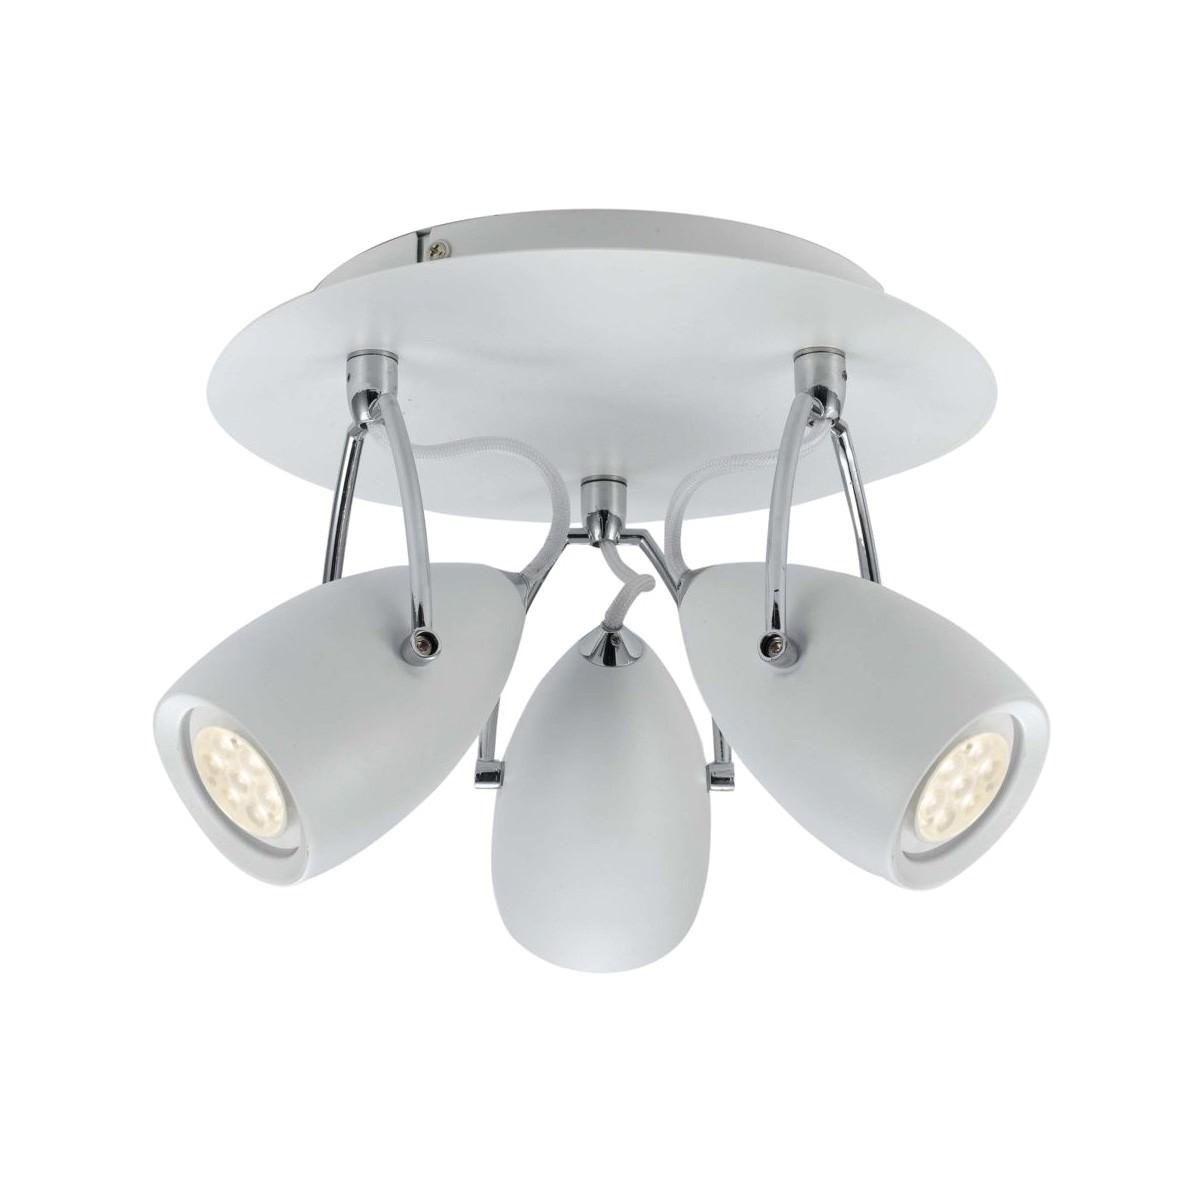 Tolosa LED Round Panel Spotlight, 3 Light, White